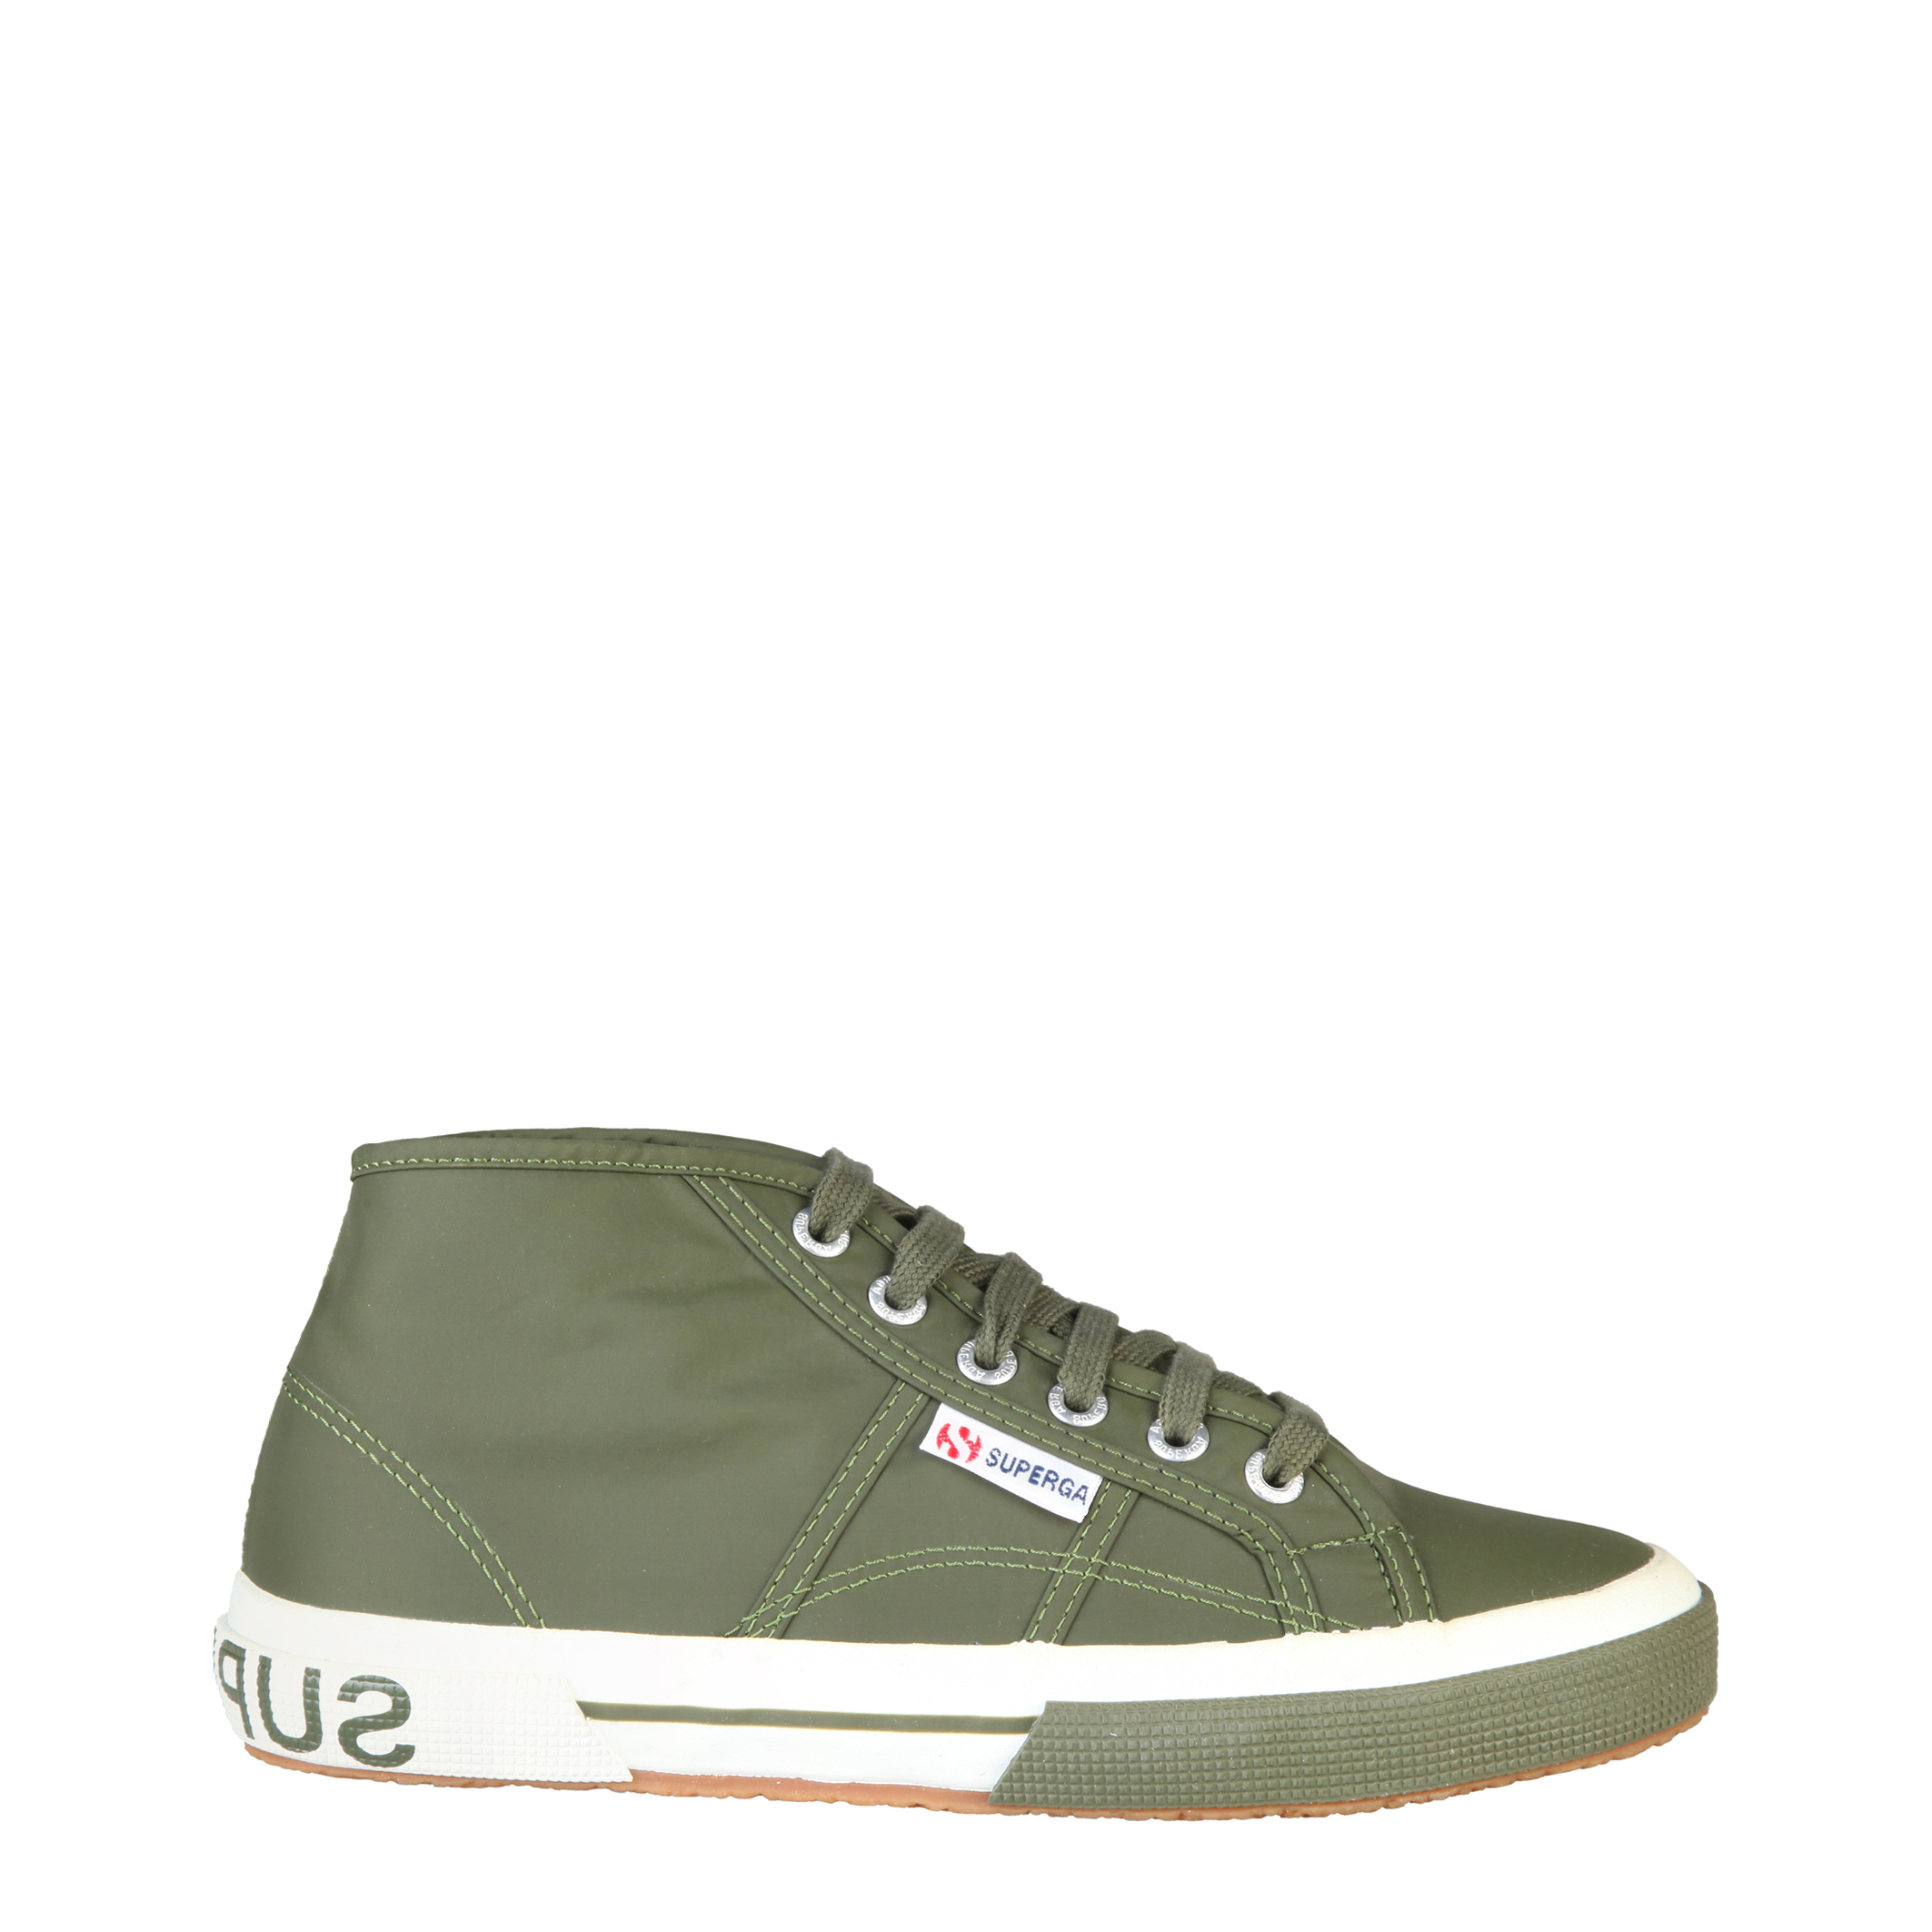 Chaussures   Superga S007A70_2754 green